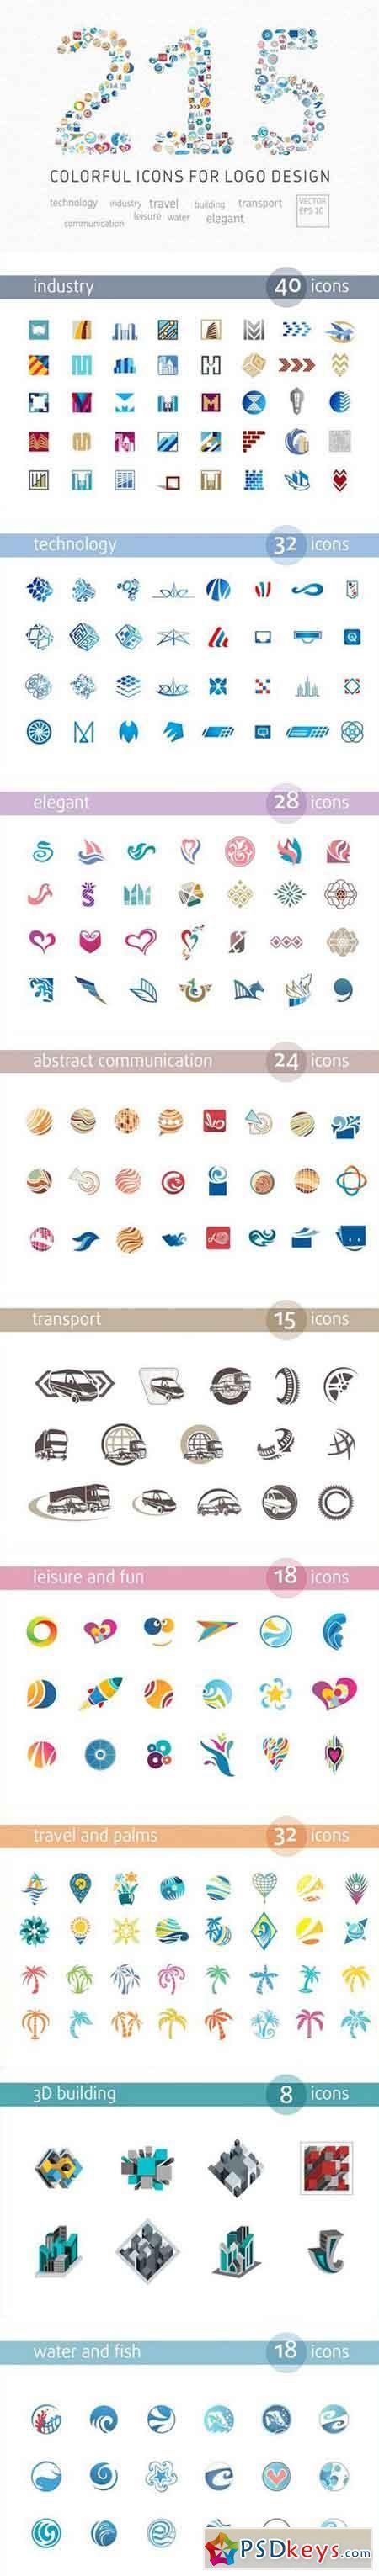 Vector Icons for Logo Design 2278656 | psd keys | Vector